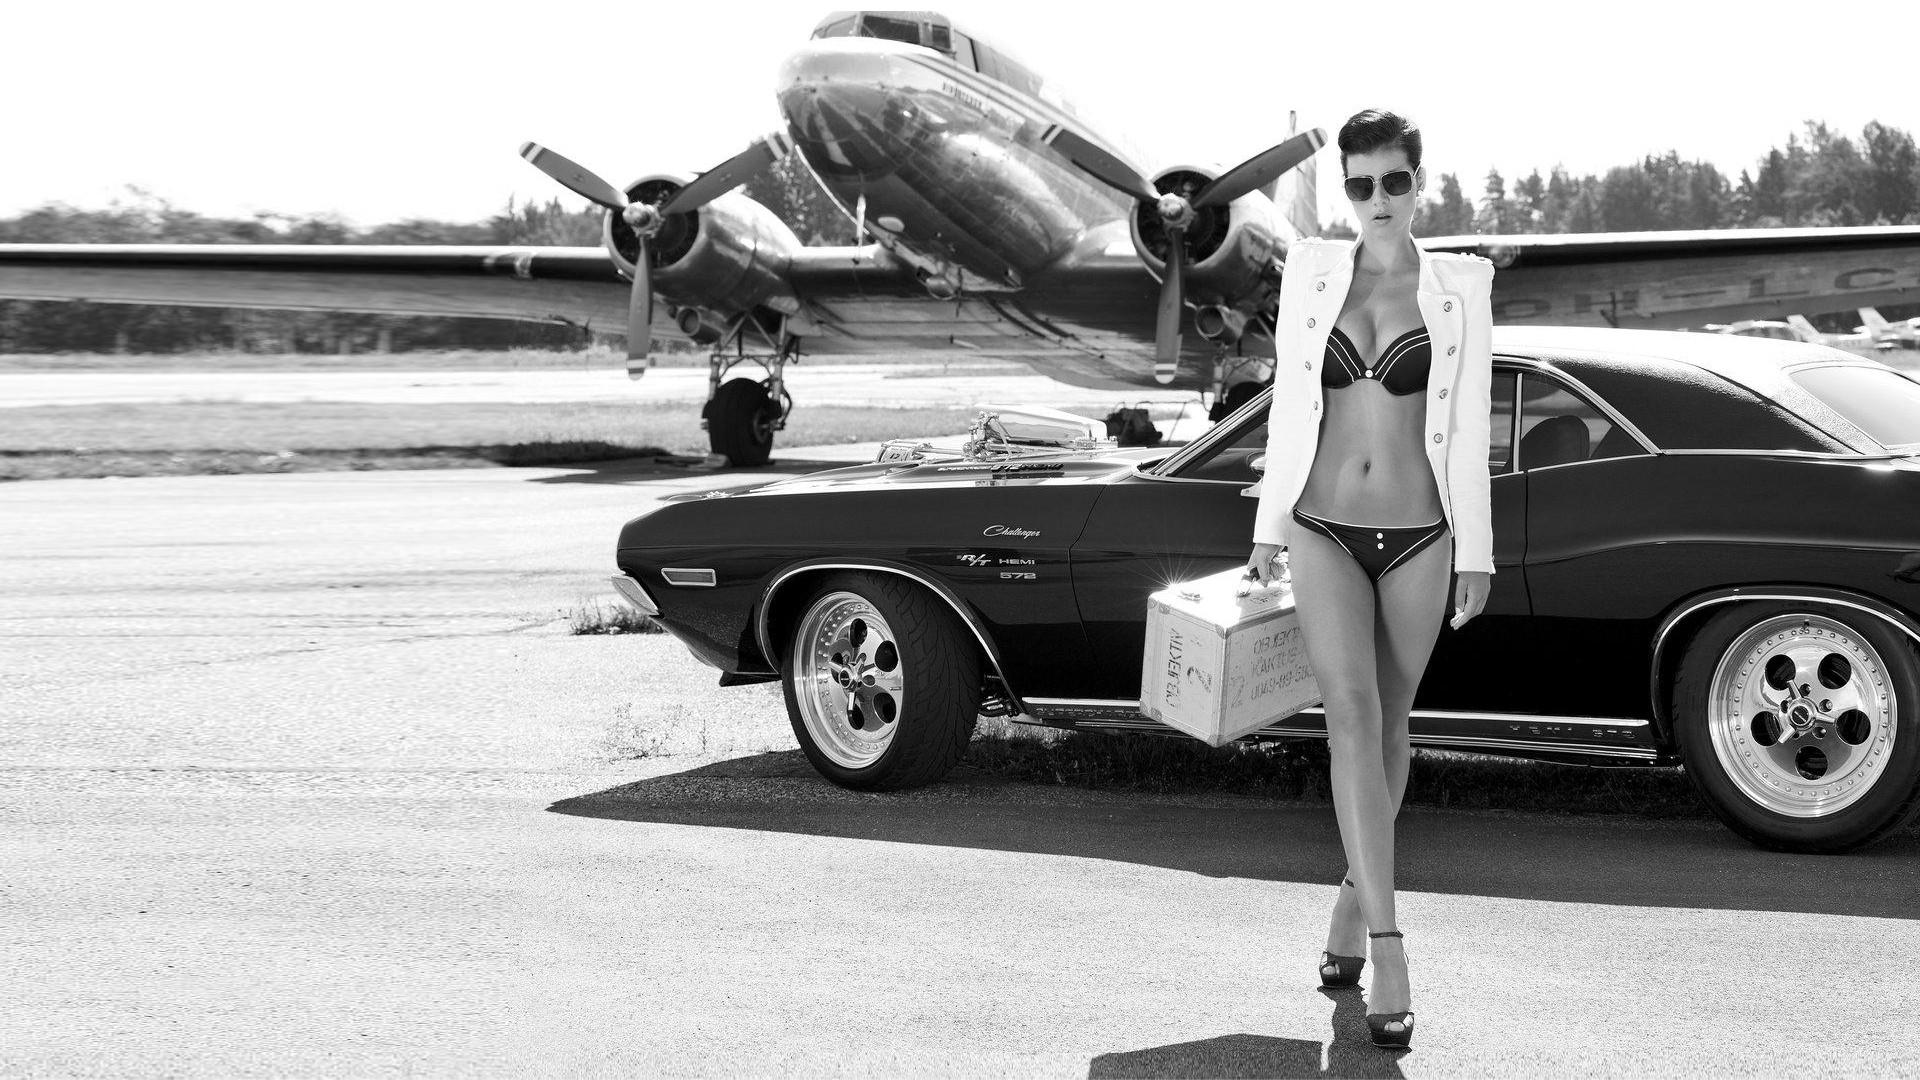 wallpaper : women with cars, propeller, lingerie, vintage car, women